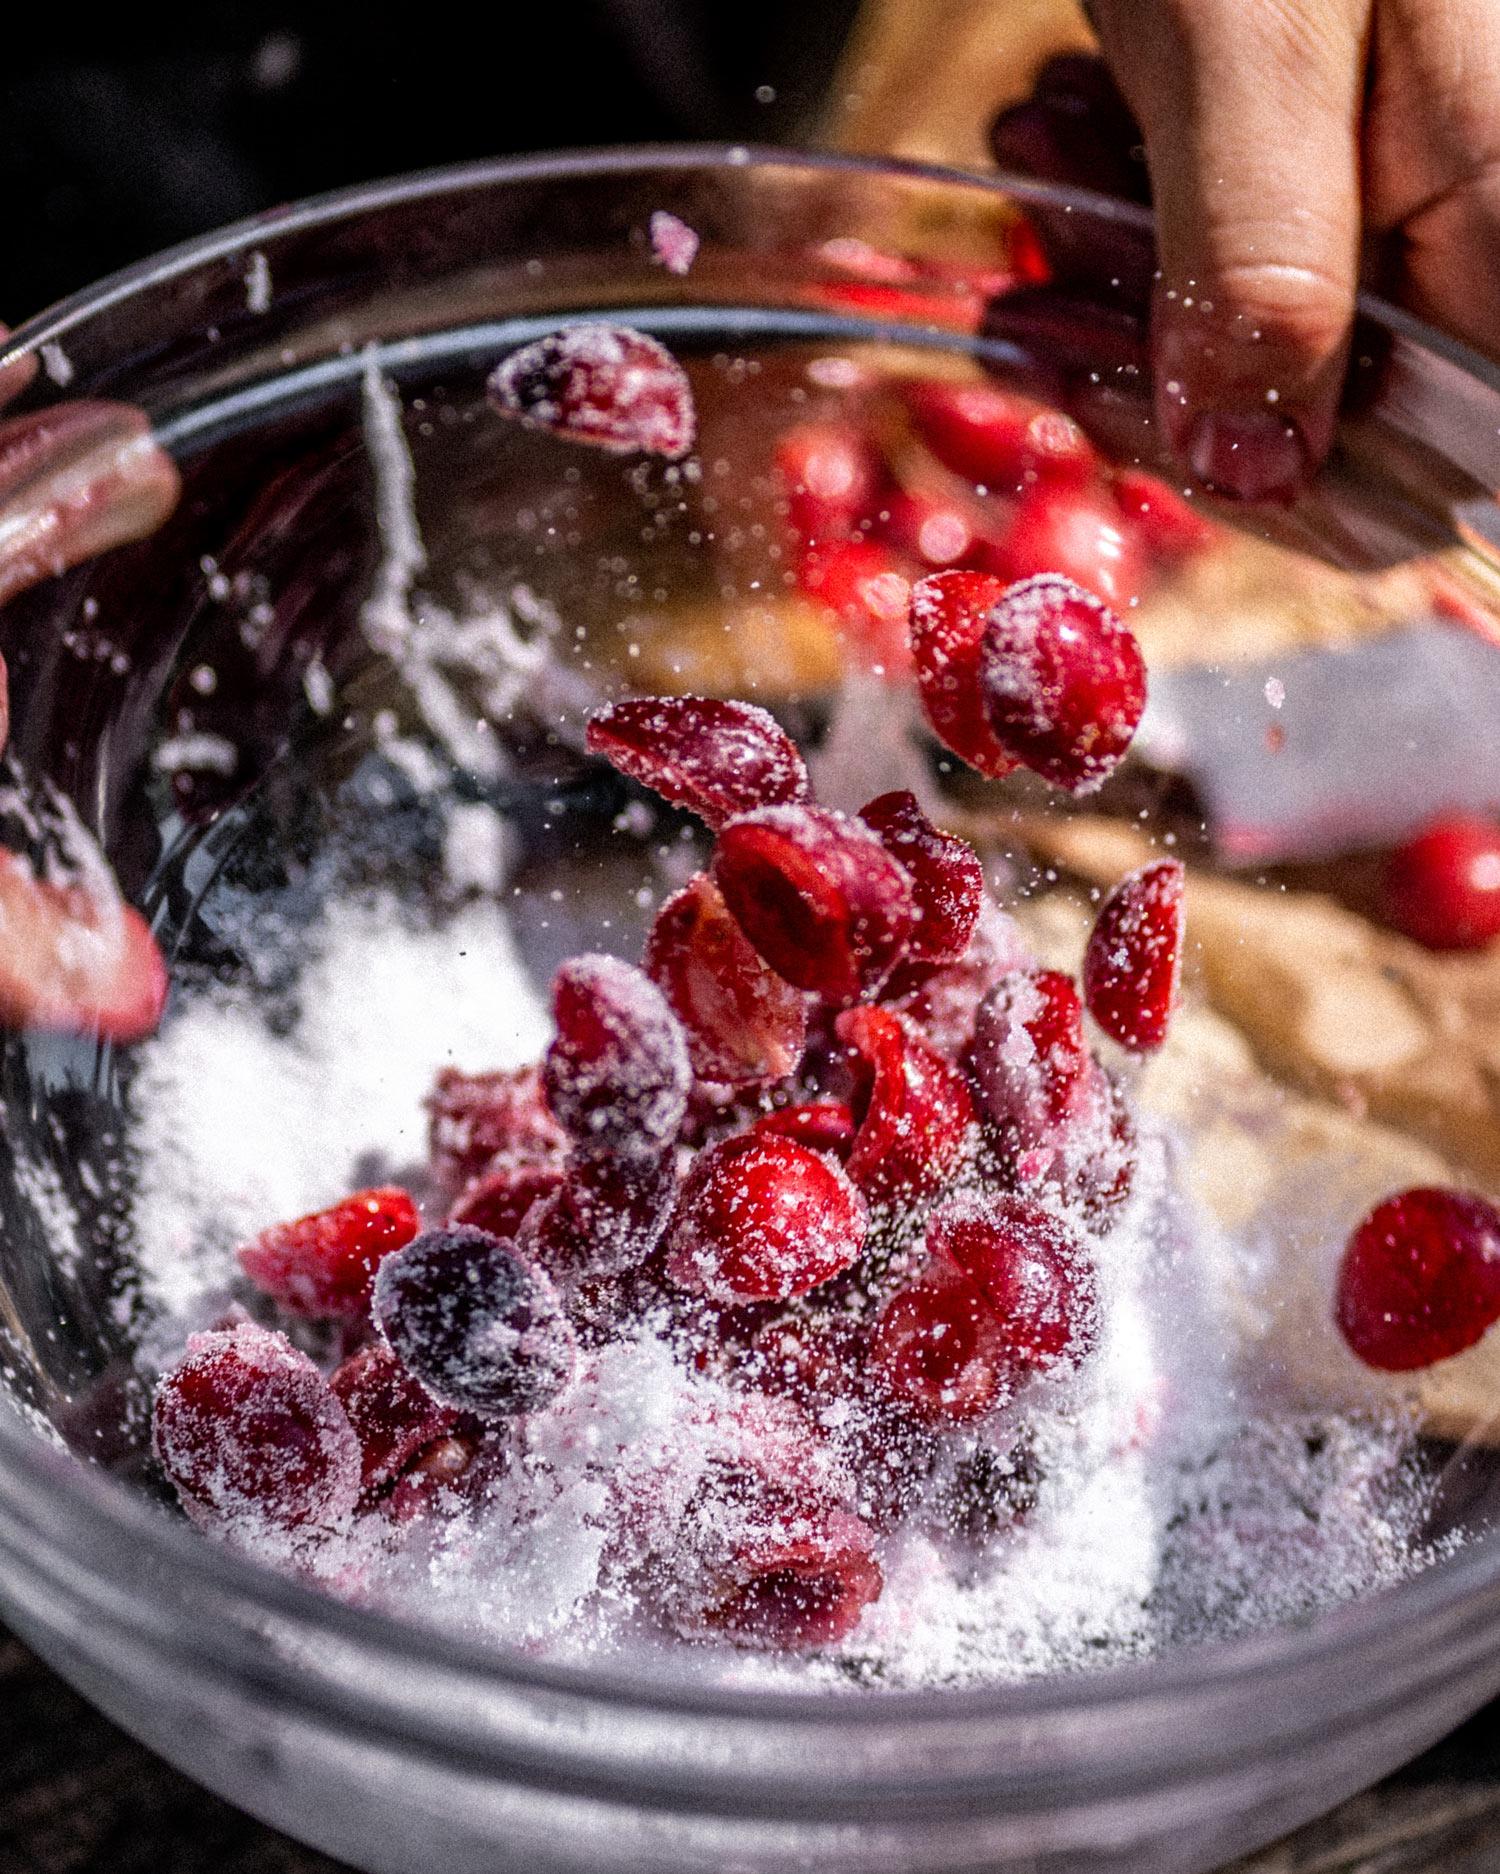 prepare the cherries